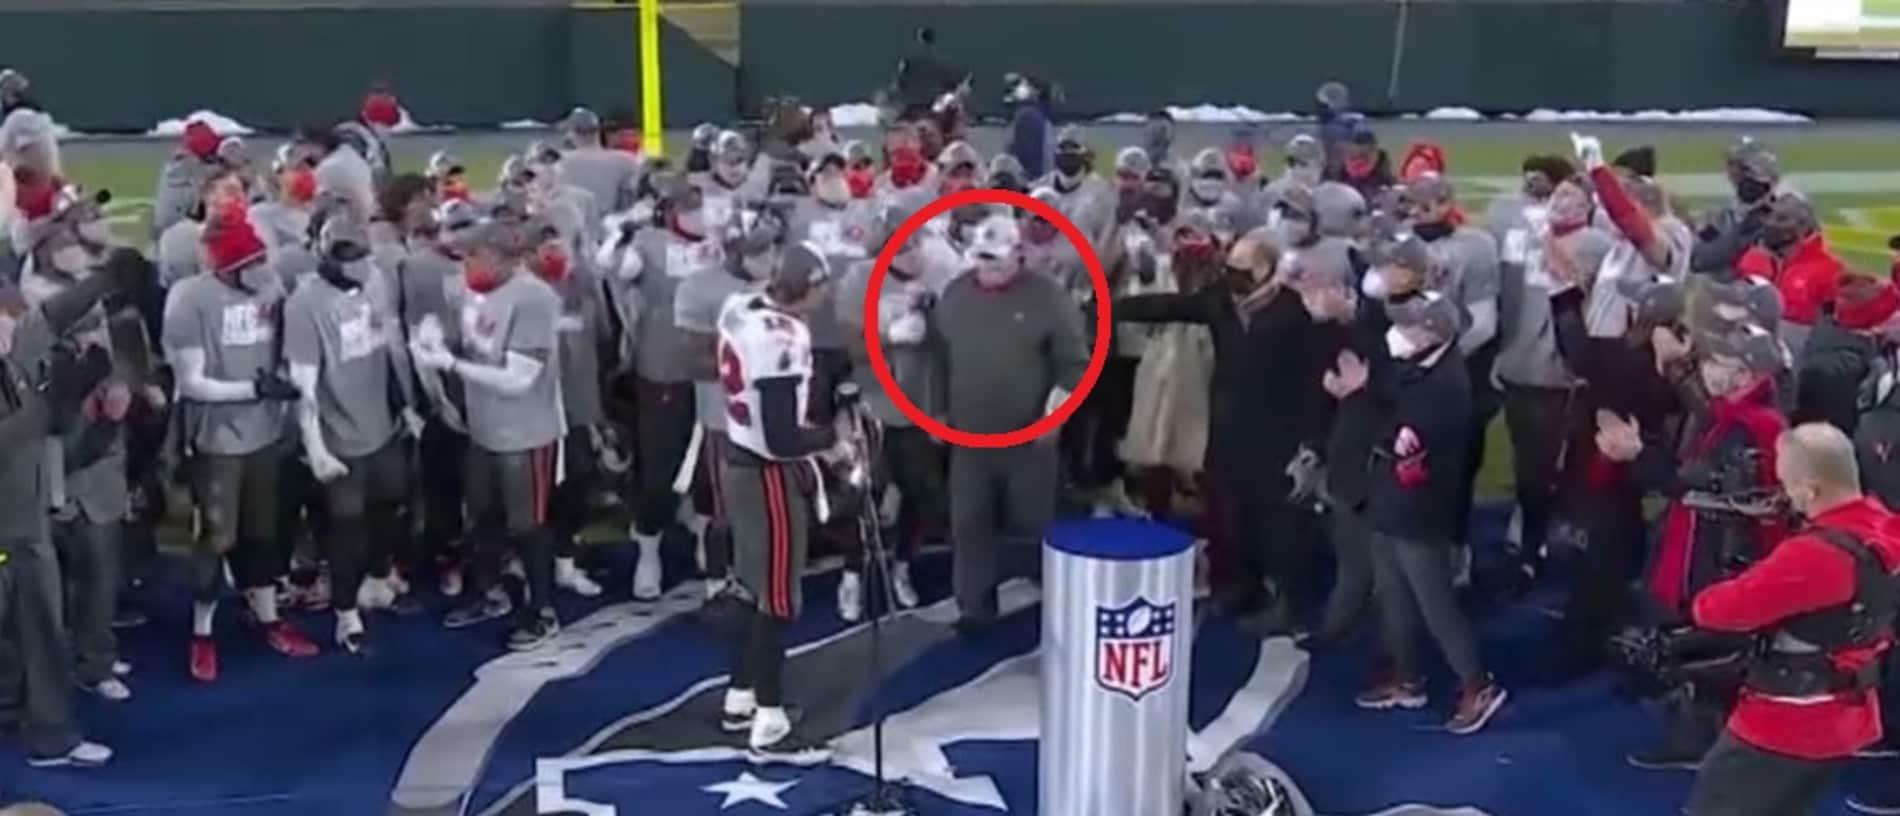 Tom Brady invites someone else to share the spotlight.